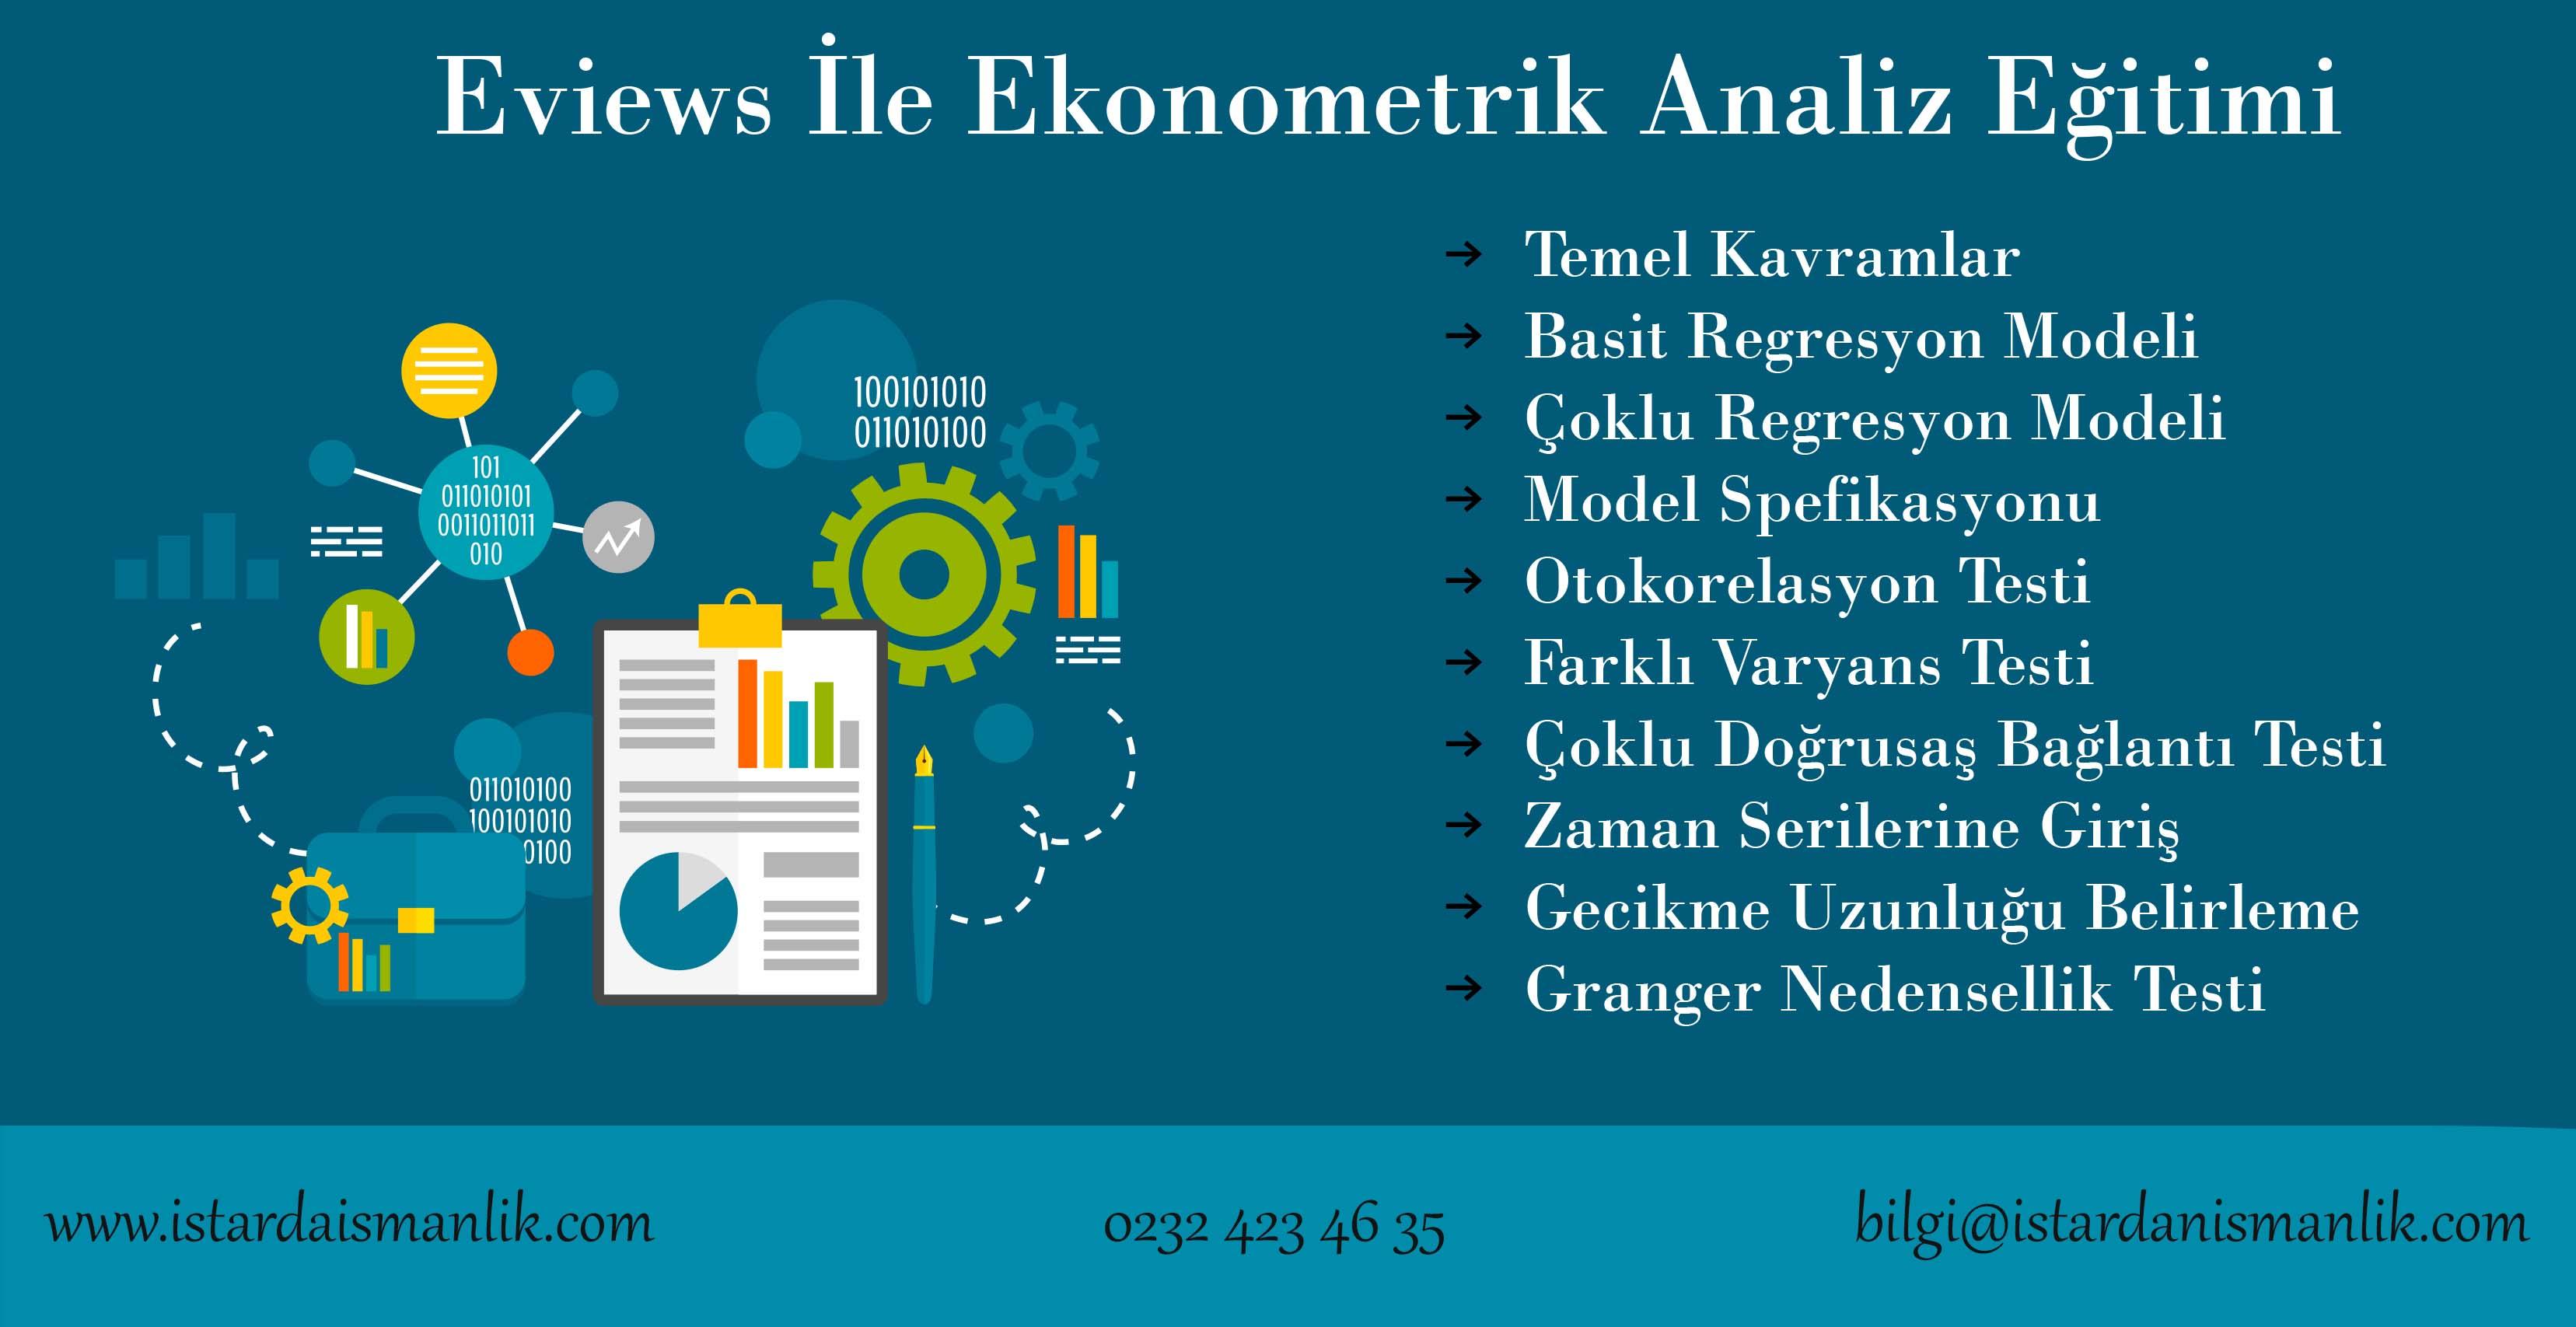 eviews ekonometrik analiz eğitimi